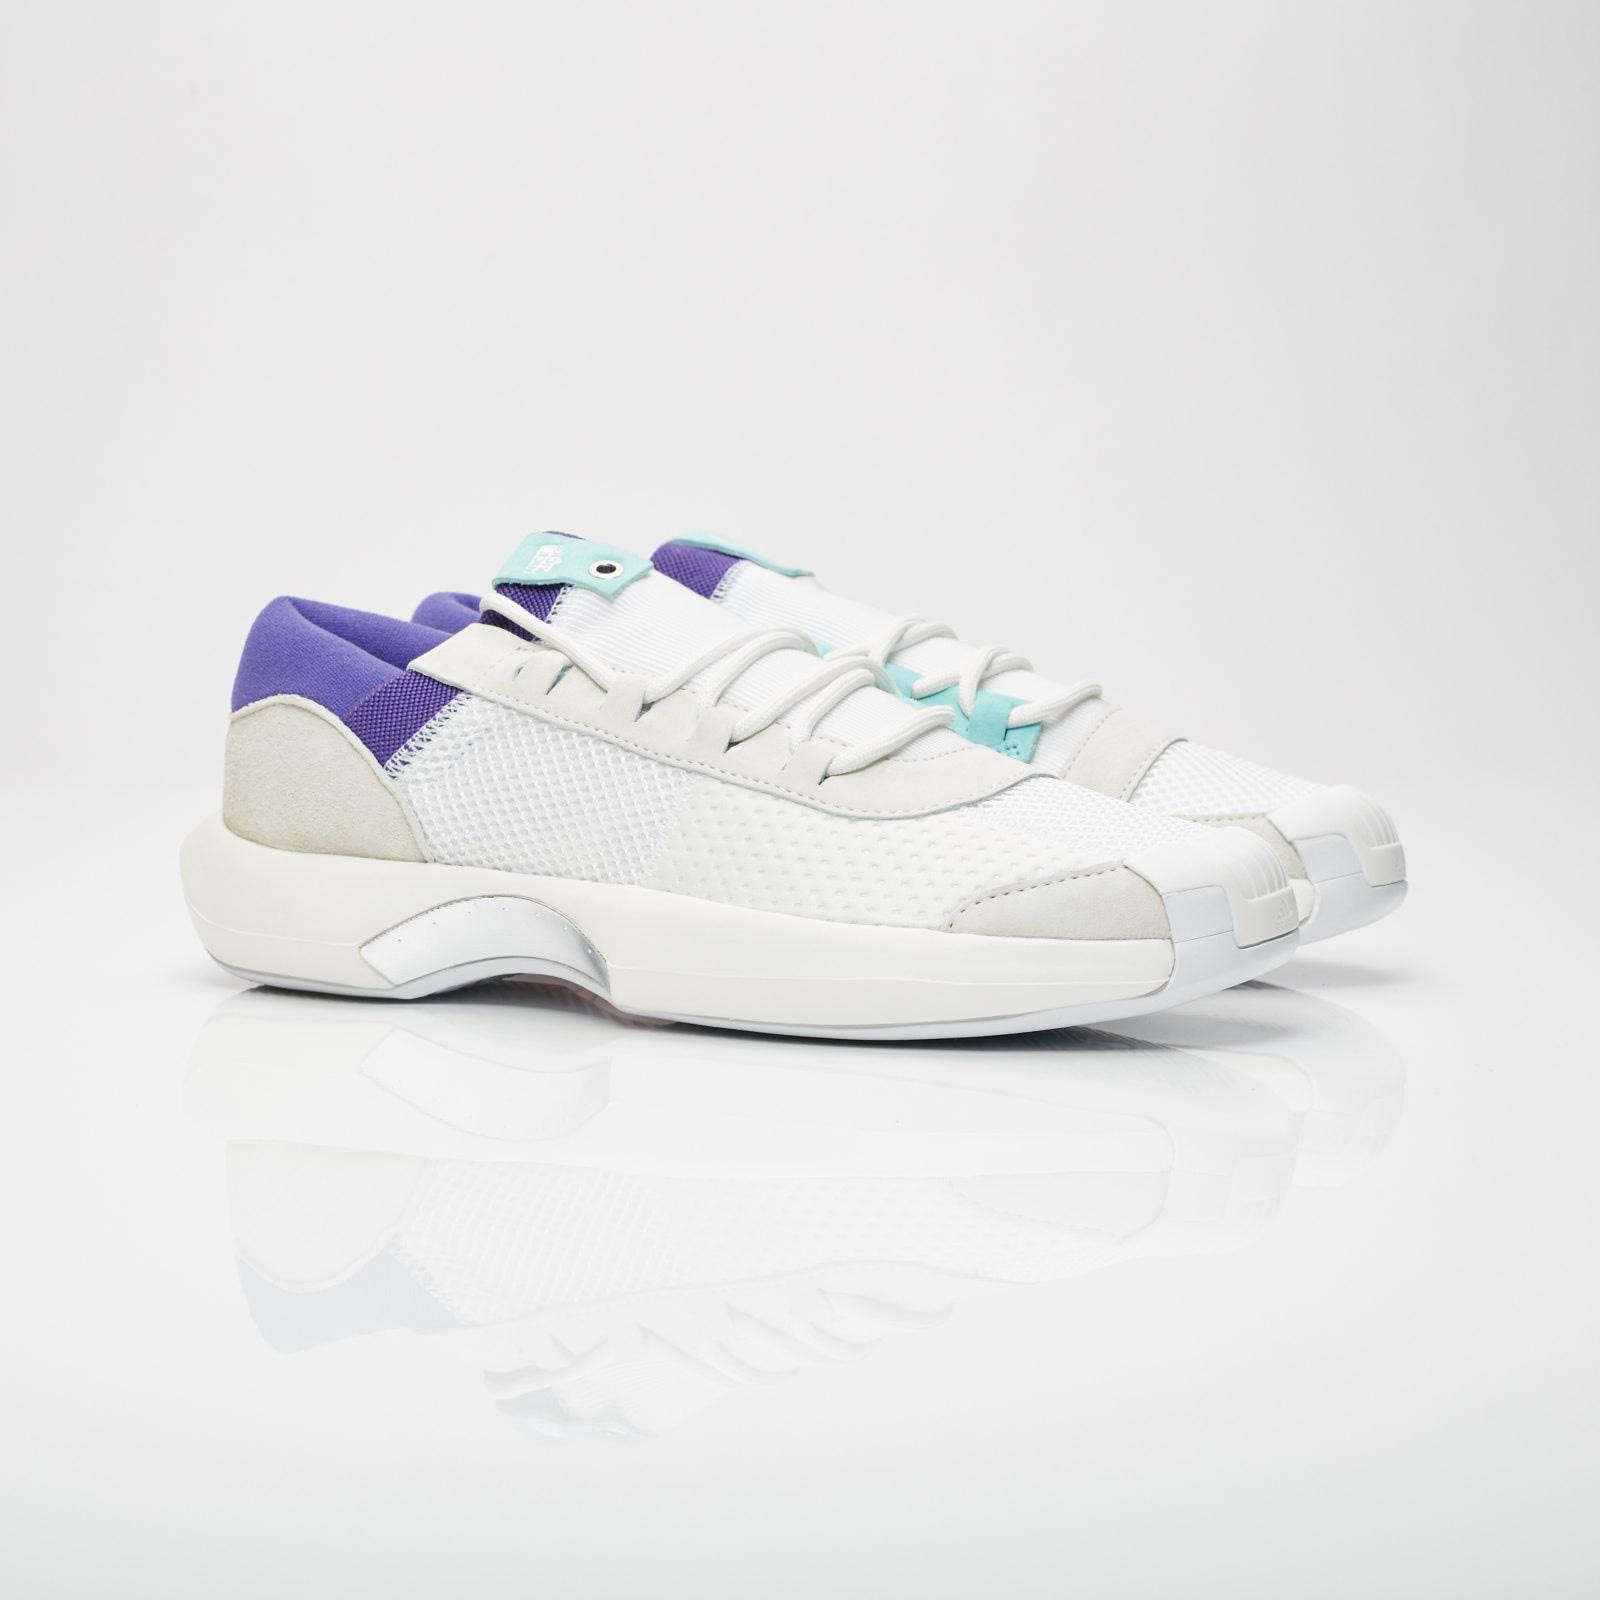 timeless design e10d4 bd31d adidas Consortium Crazy 1 x Nice Kicks